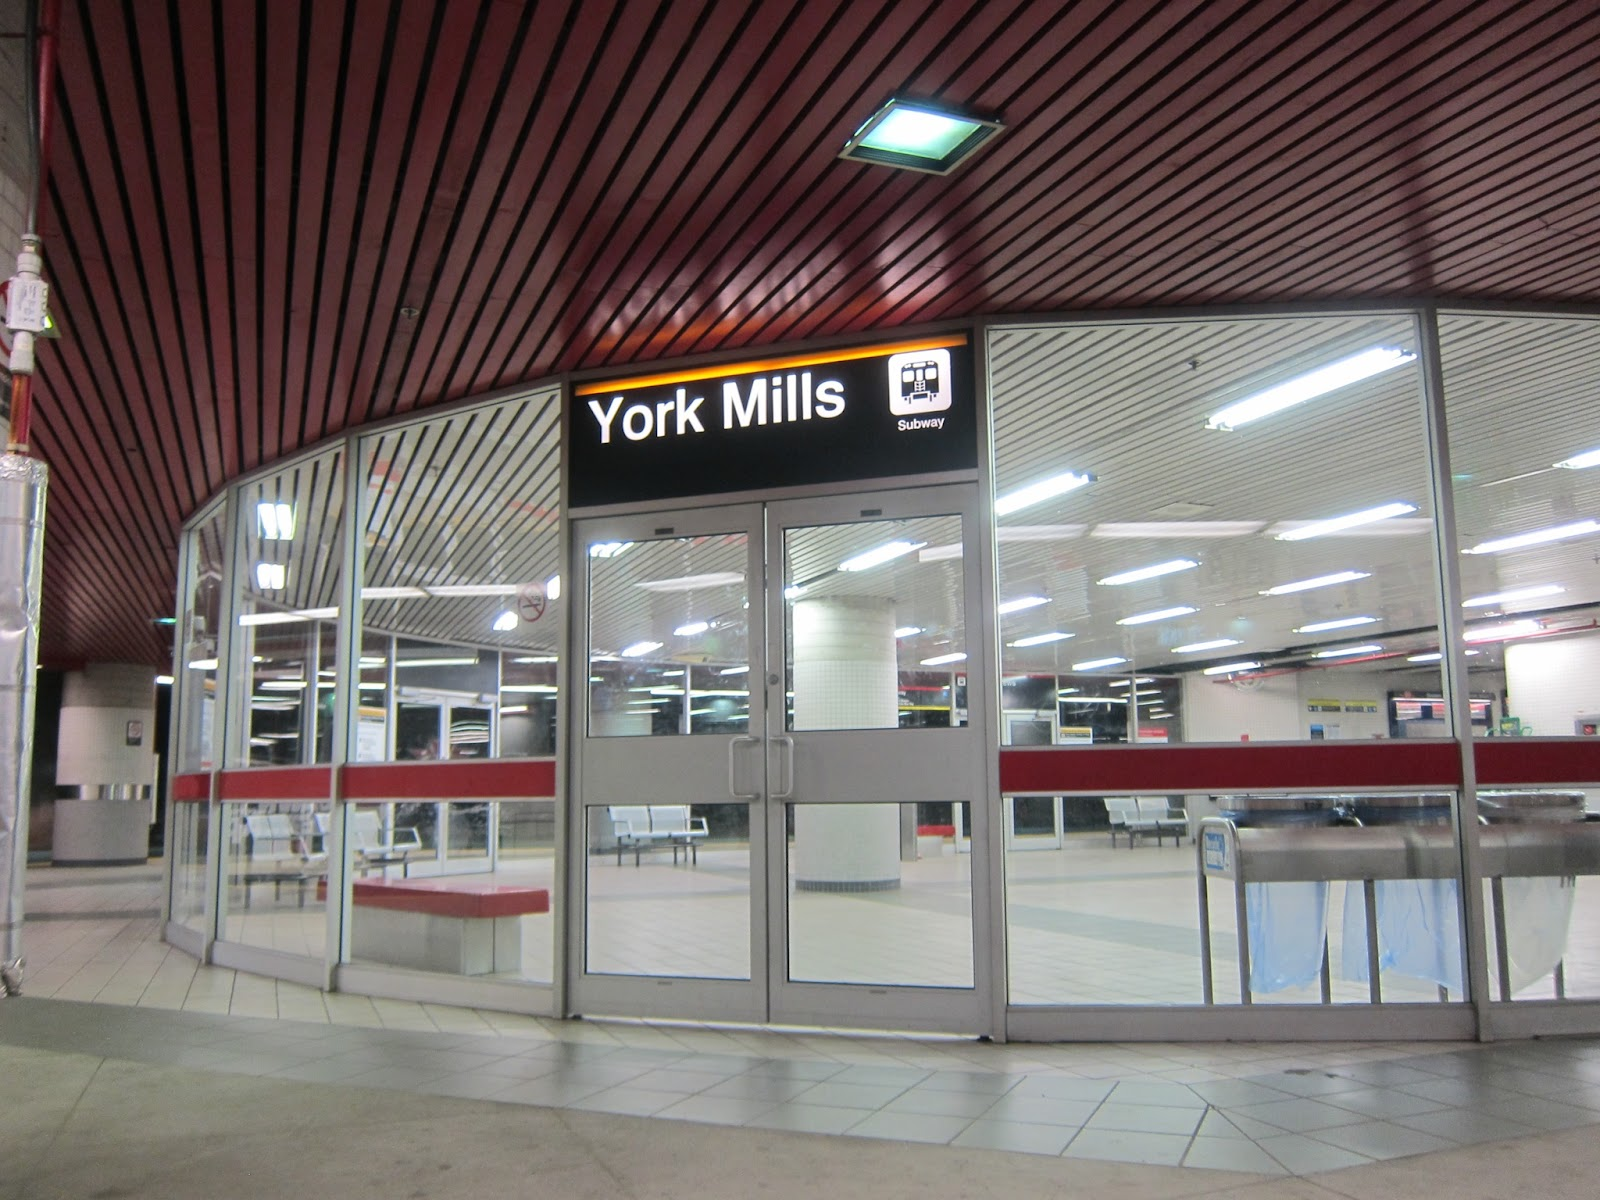 York Mills bus platform